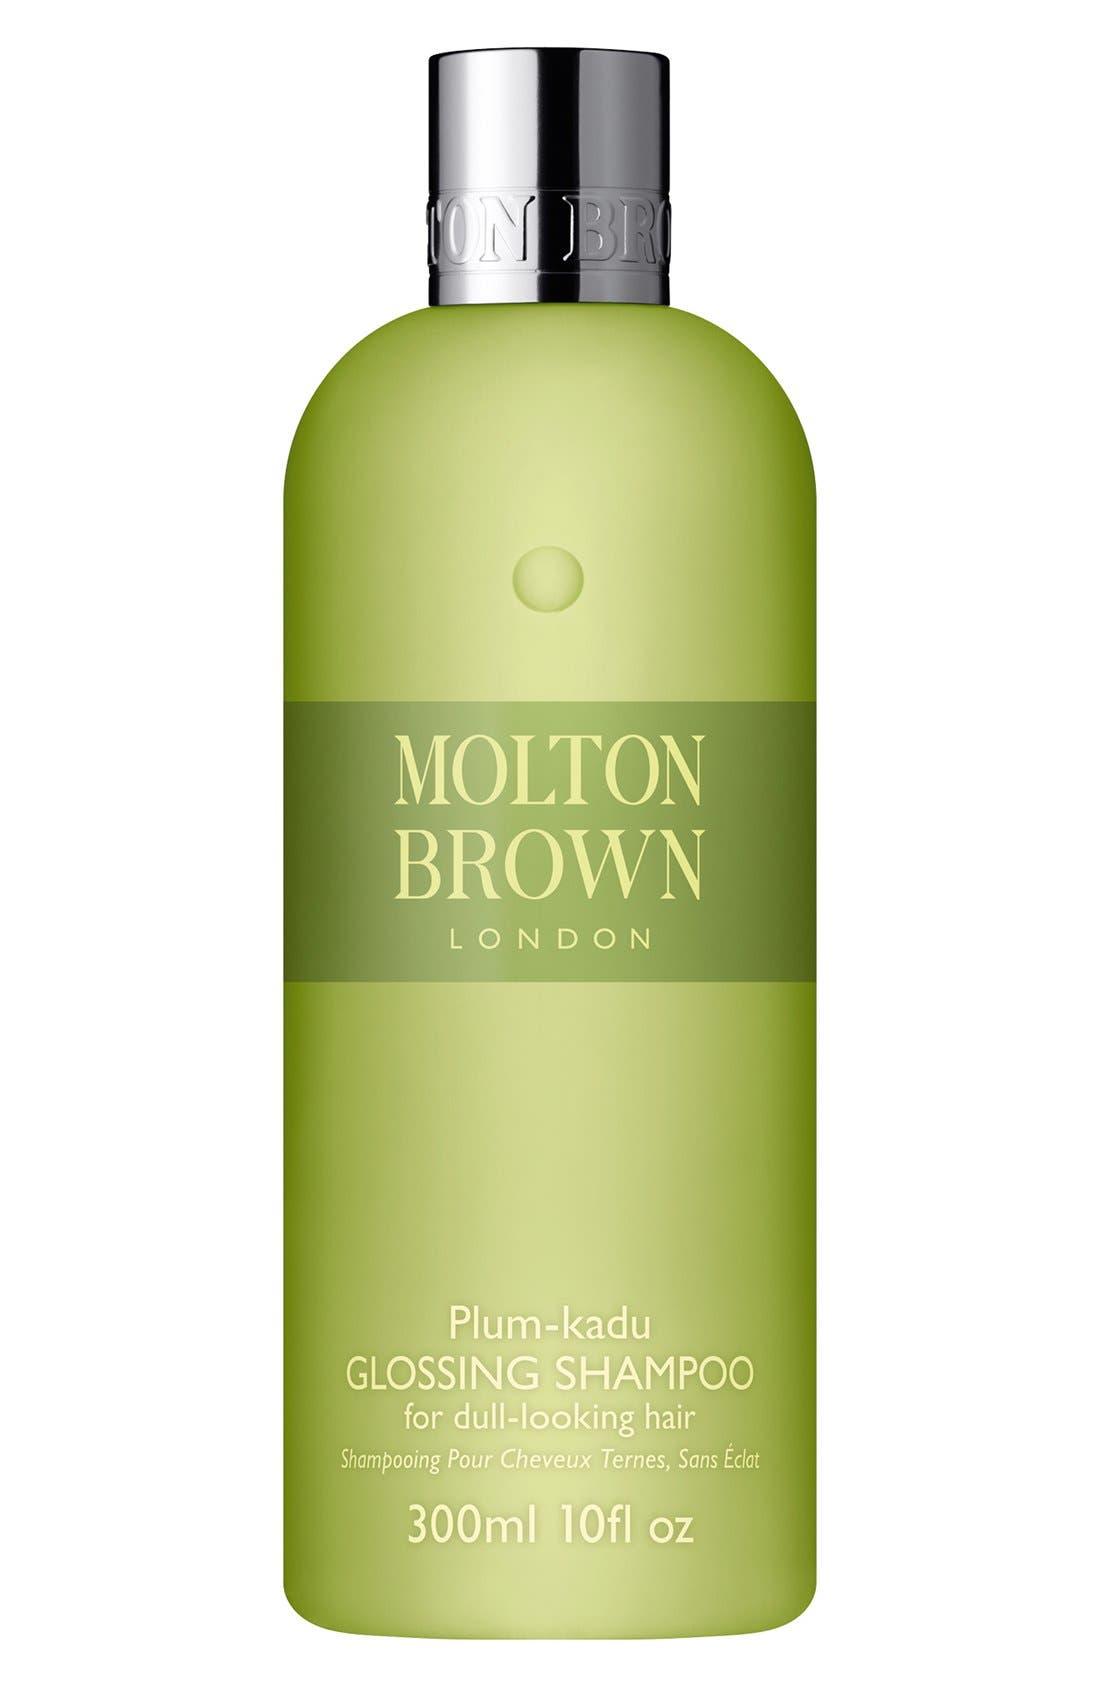 MOLTON BROWN London 'Plum-kadu' Glossing Shampoo